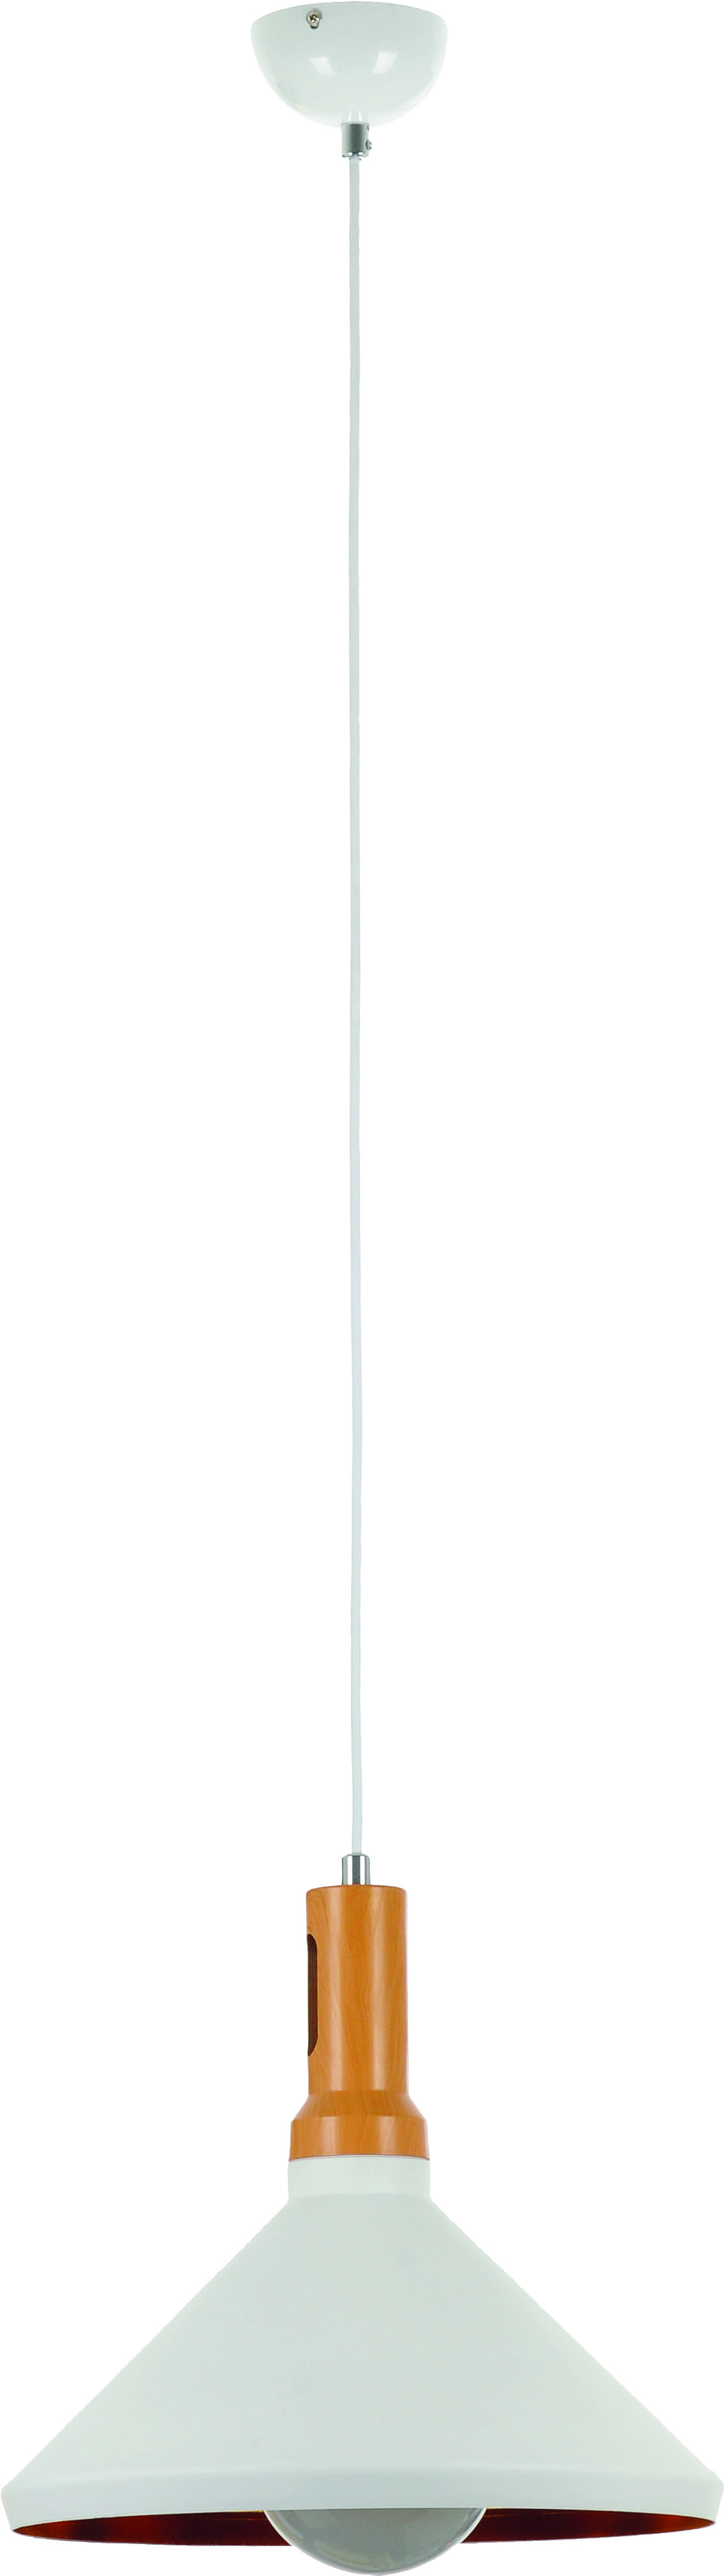 Hanging lamp Selene white lampshade 60W wood